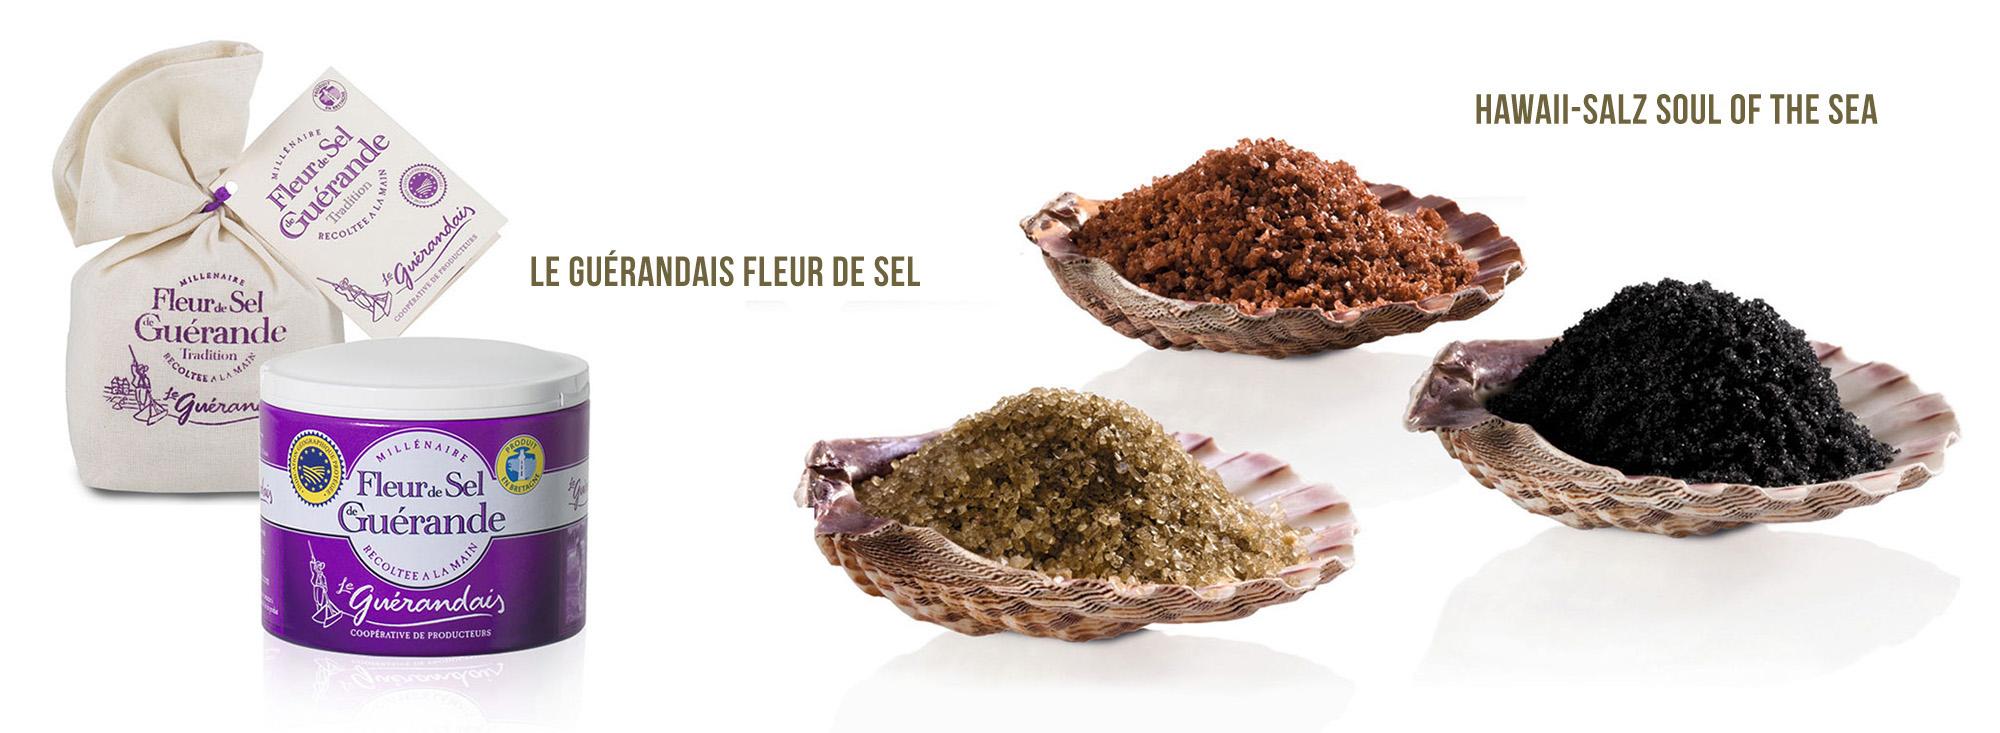 Le Guérandais Fleur de Sel / Hawaii-Salz Soul of the Sea